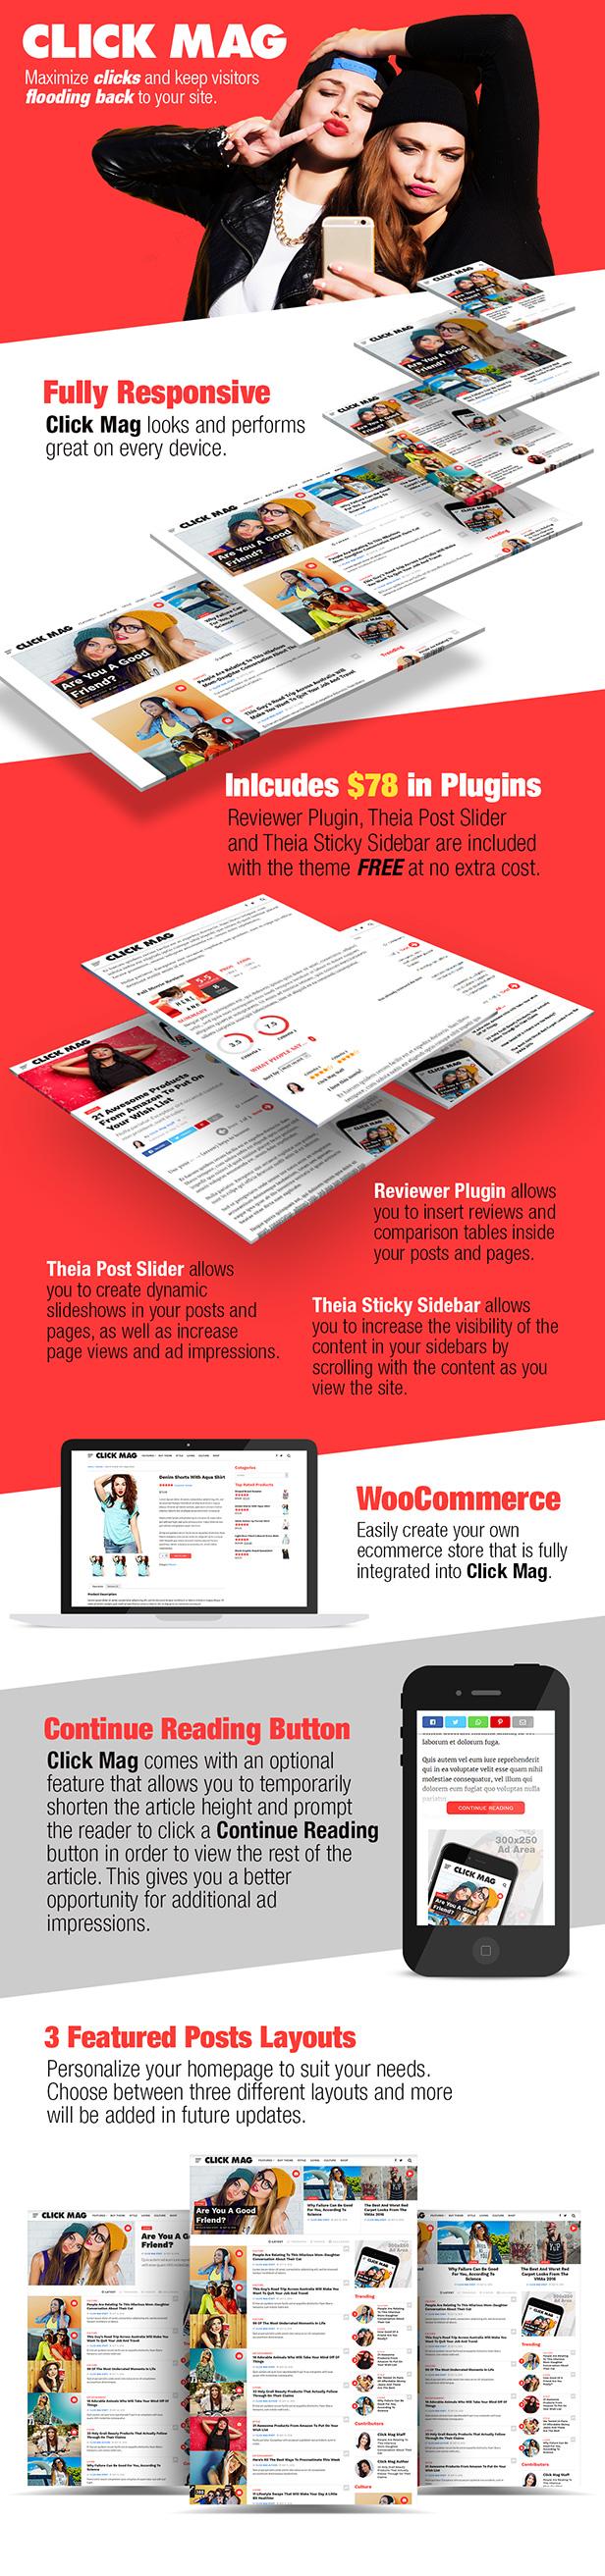 Click Mag - Viral WordPress News Magazine/Blog Theme - 1